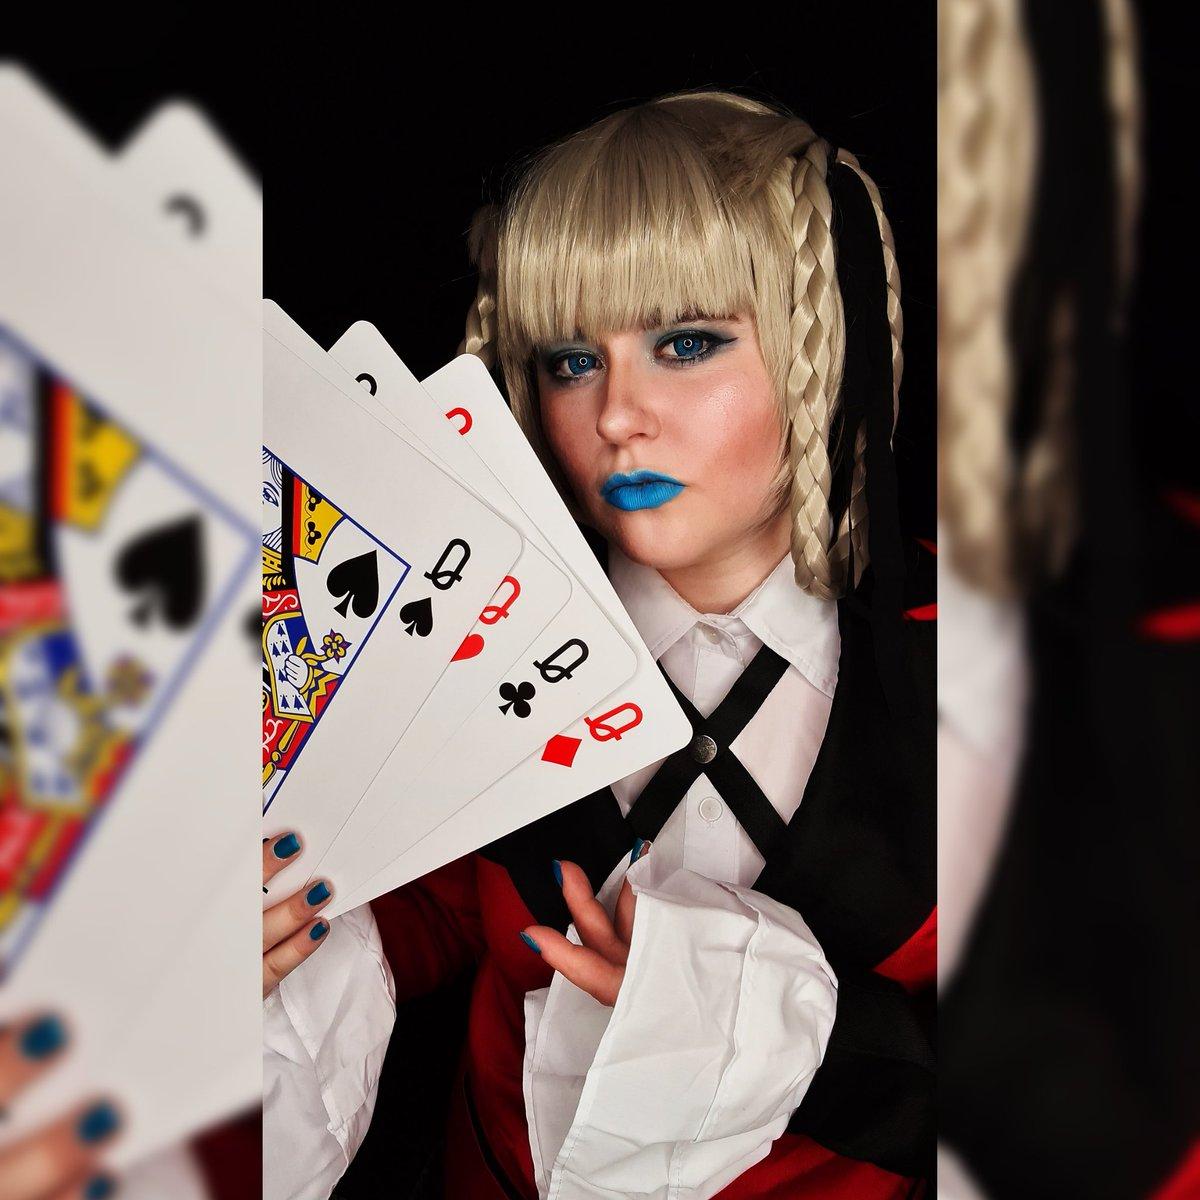 'Show me your cards?'  #kakegurui #kakeguruicosplay #kakeguruikirari #kirarimomobami #kirarimomobamicosplay #kiraricosplay #gambling #netflix #studentpresident #anime #manga #cosplay #cosplaygirl #cards #poker #addictionpic.twitter.com/AyqFUMjJka